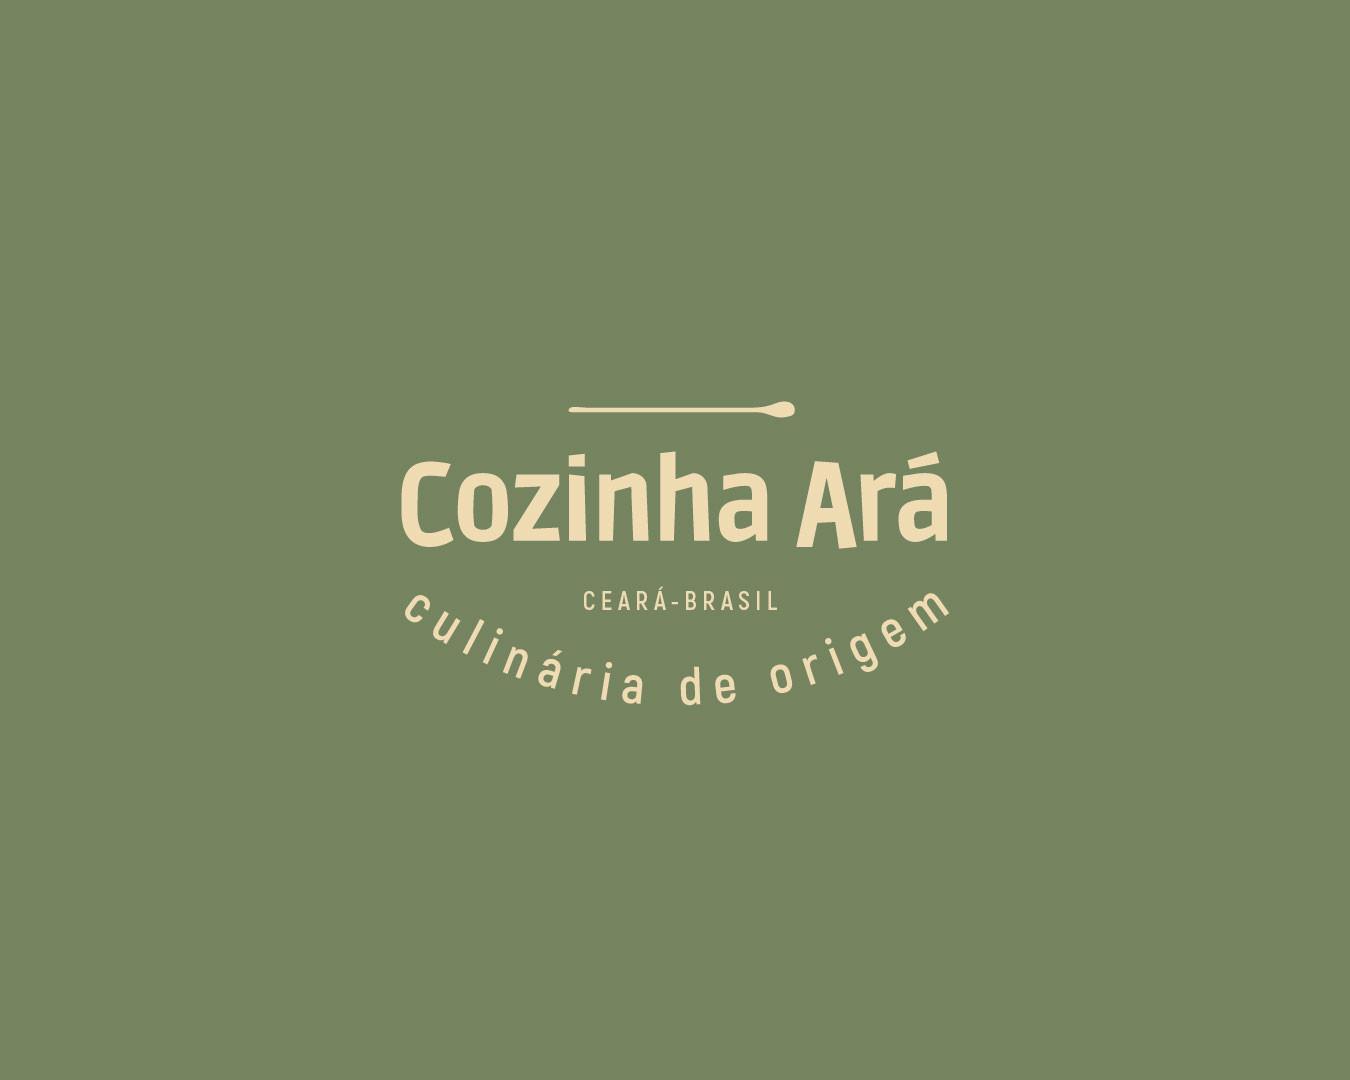 Cozinha_Ará_-_Marca_Marca_2_Cor_+_BG_1.